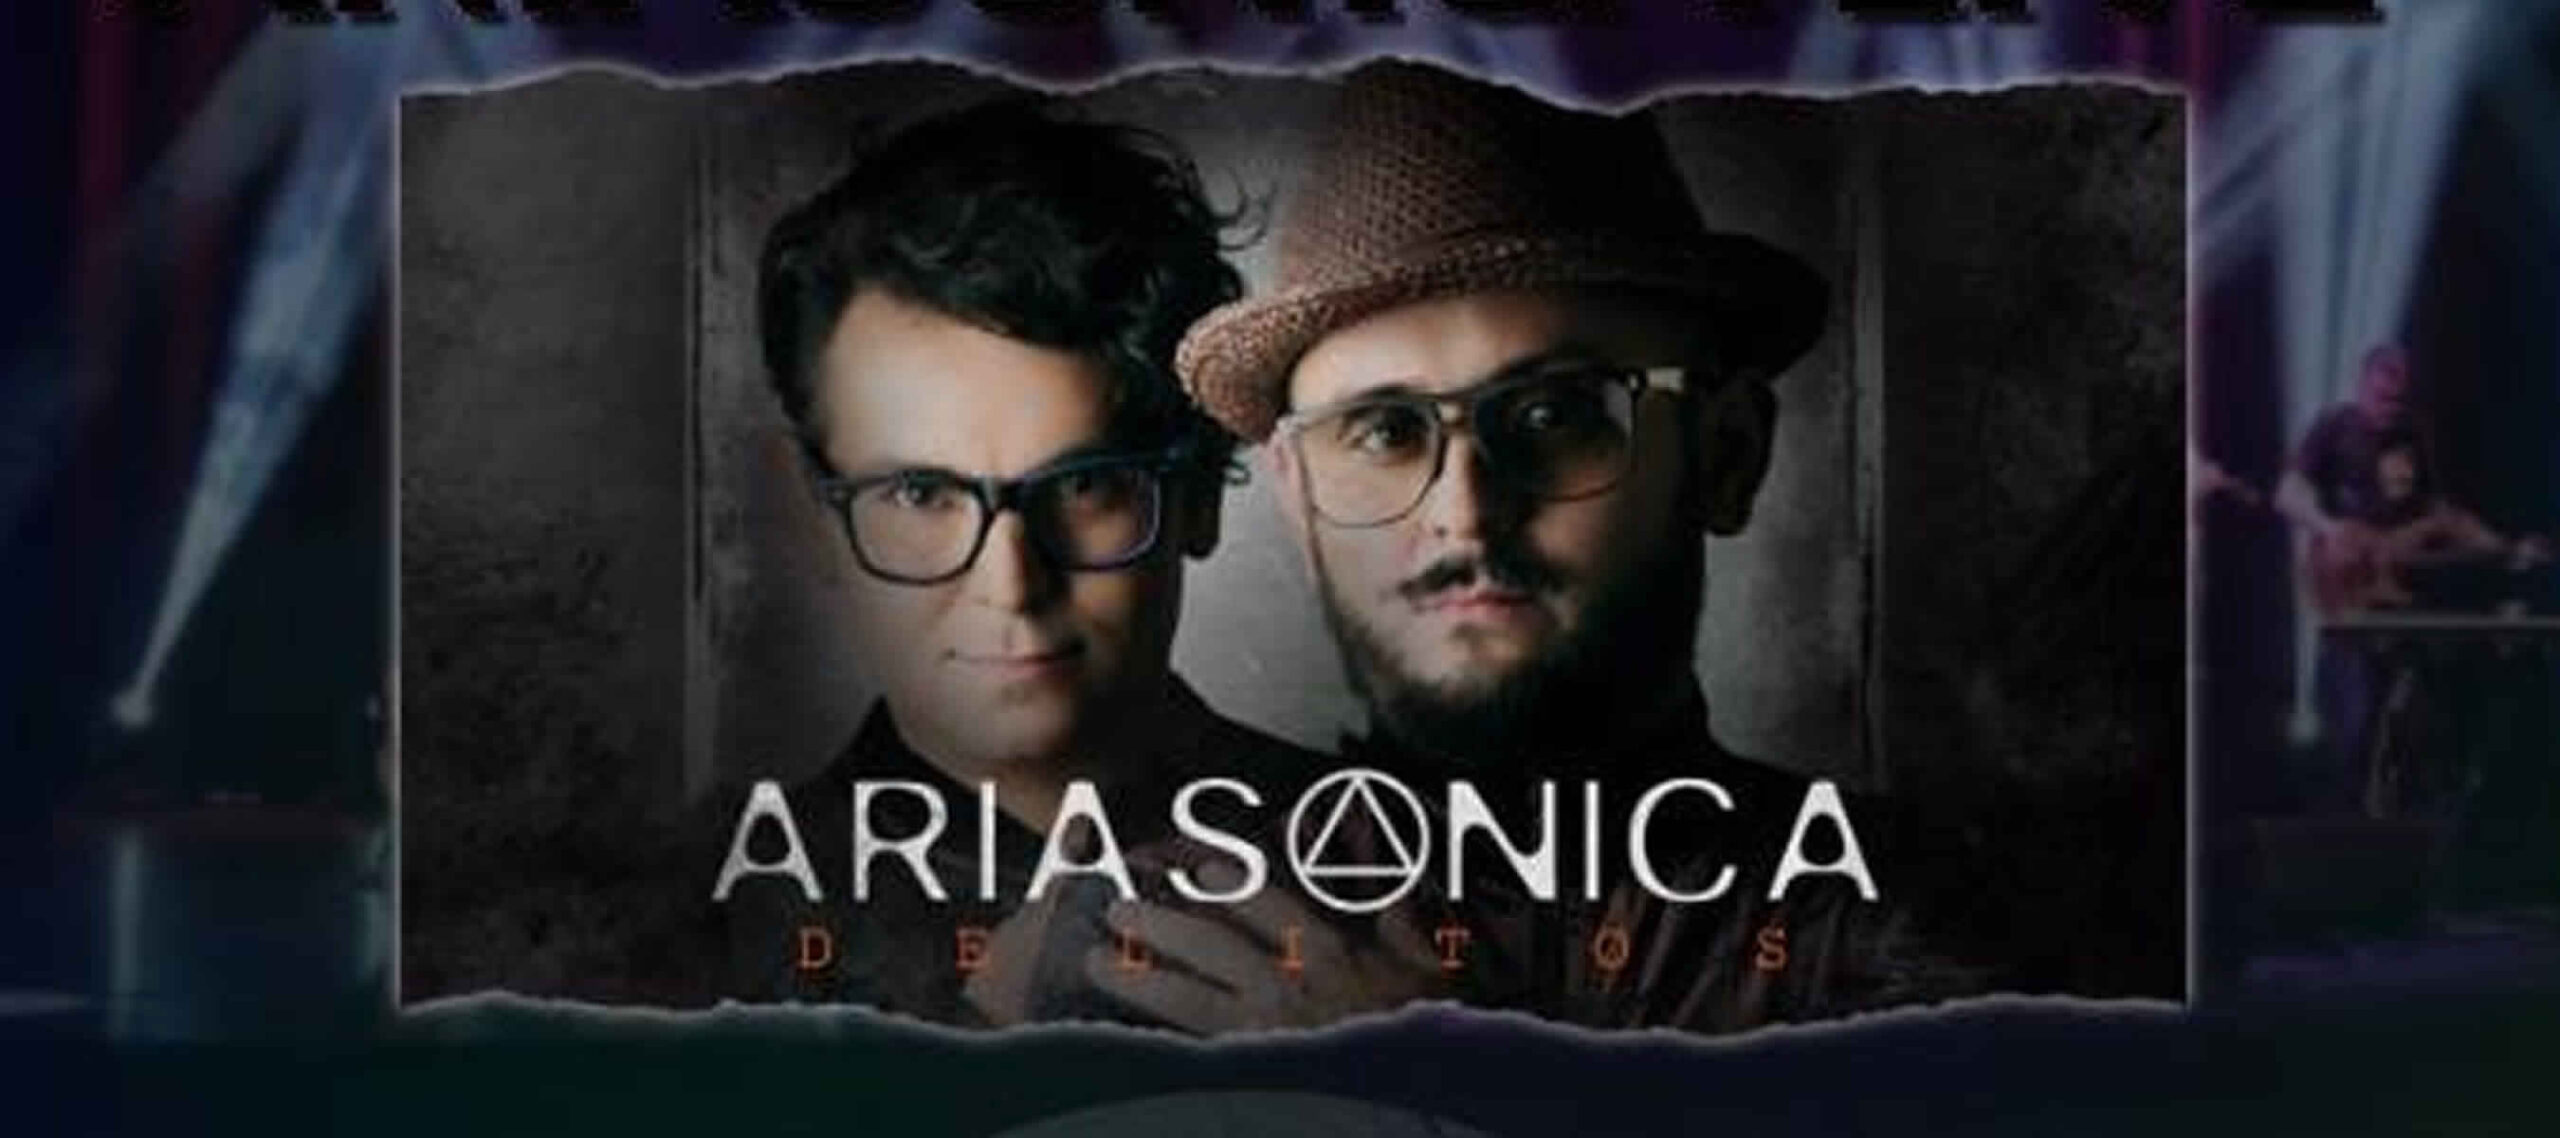 Ariasonica